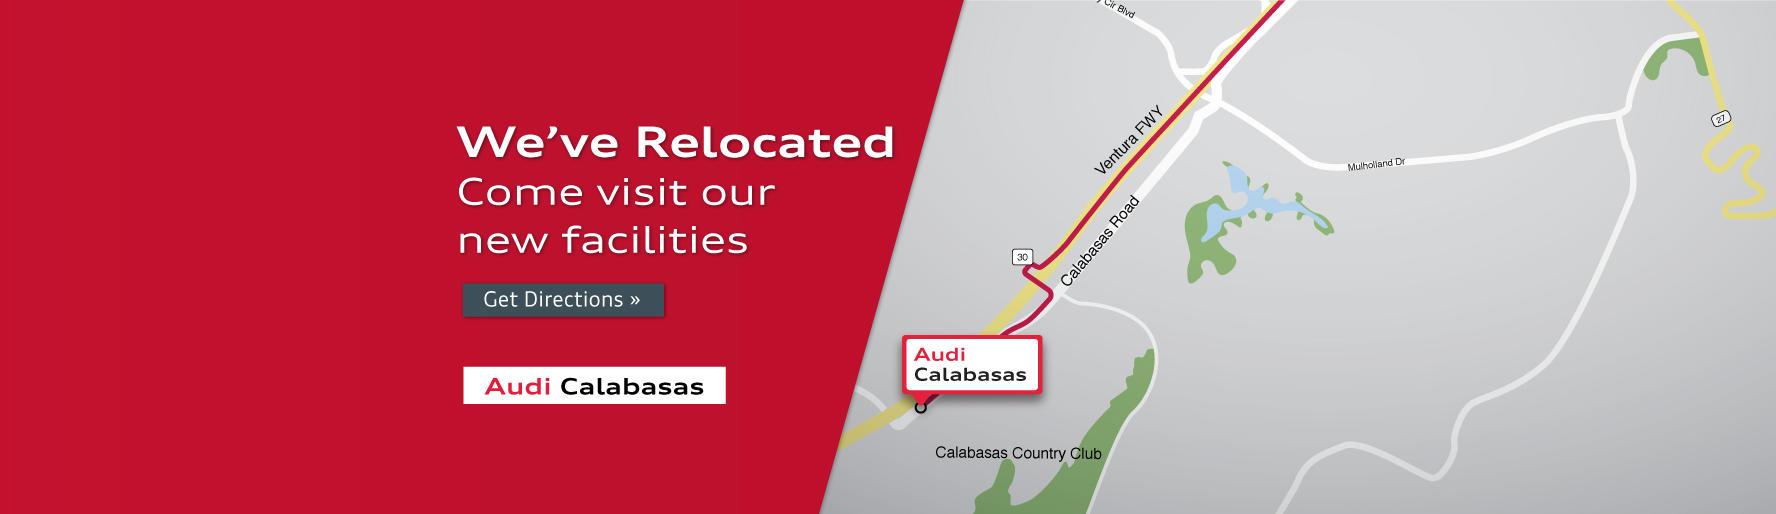 Audi Calabasas image 1